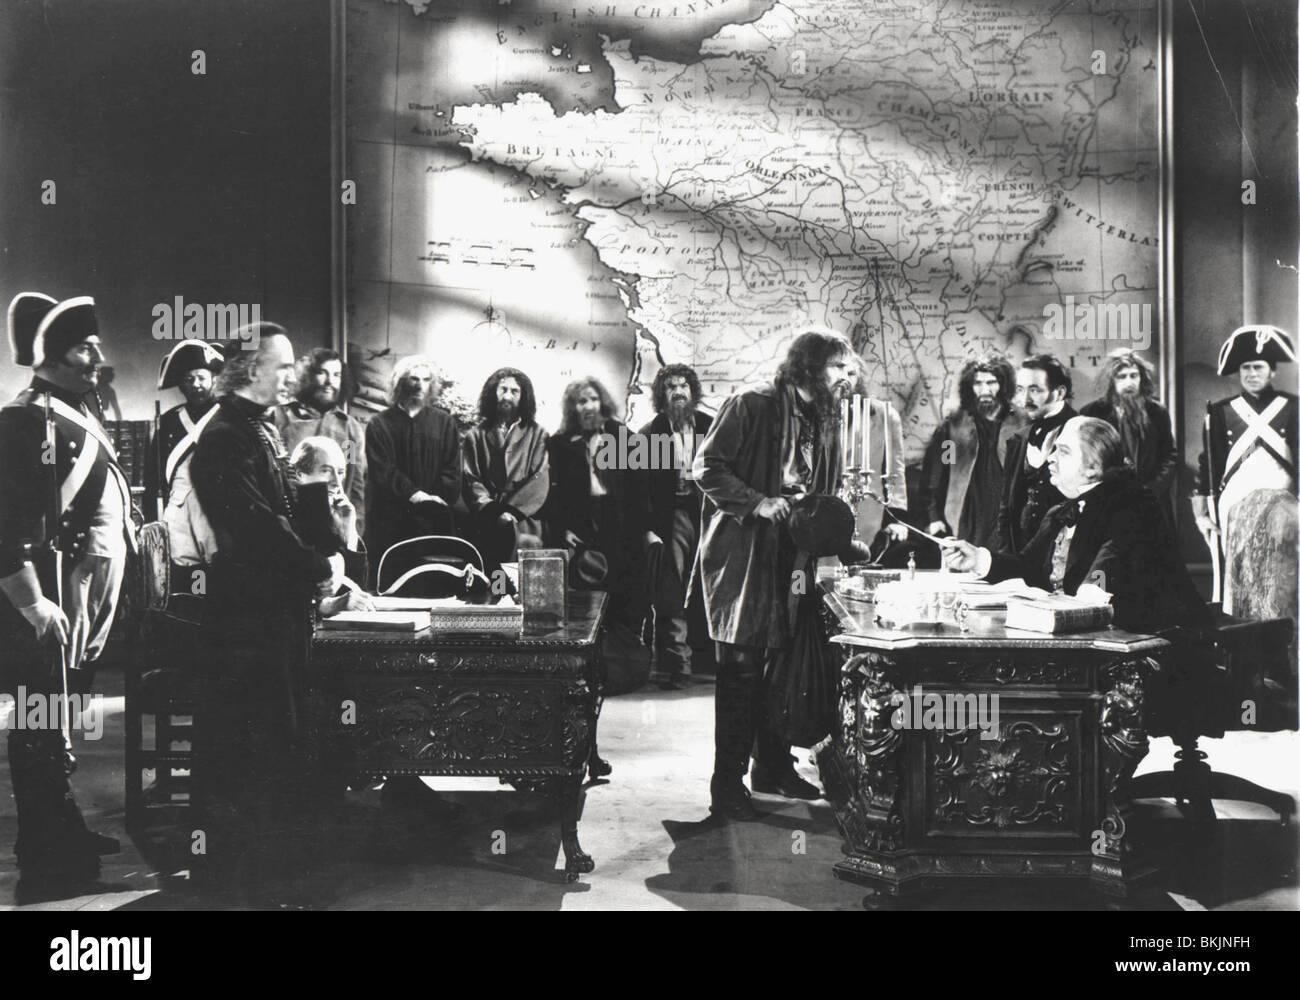 LES MISERABLES (1935) FREDRIC MARCH, CHARLES LAUGHTON, CEDRIC HARDWICKE,  RICHARD BOLELAWSKI (DIR) MISR 002 P